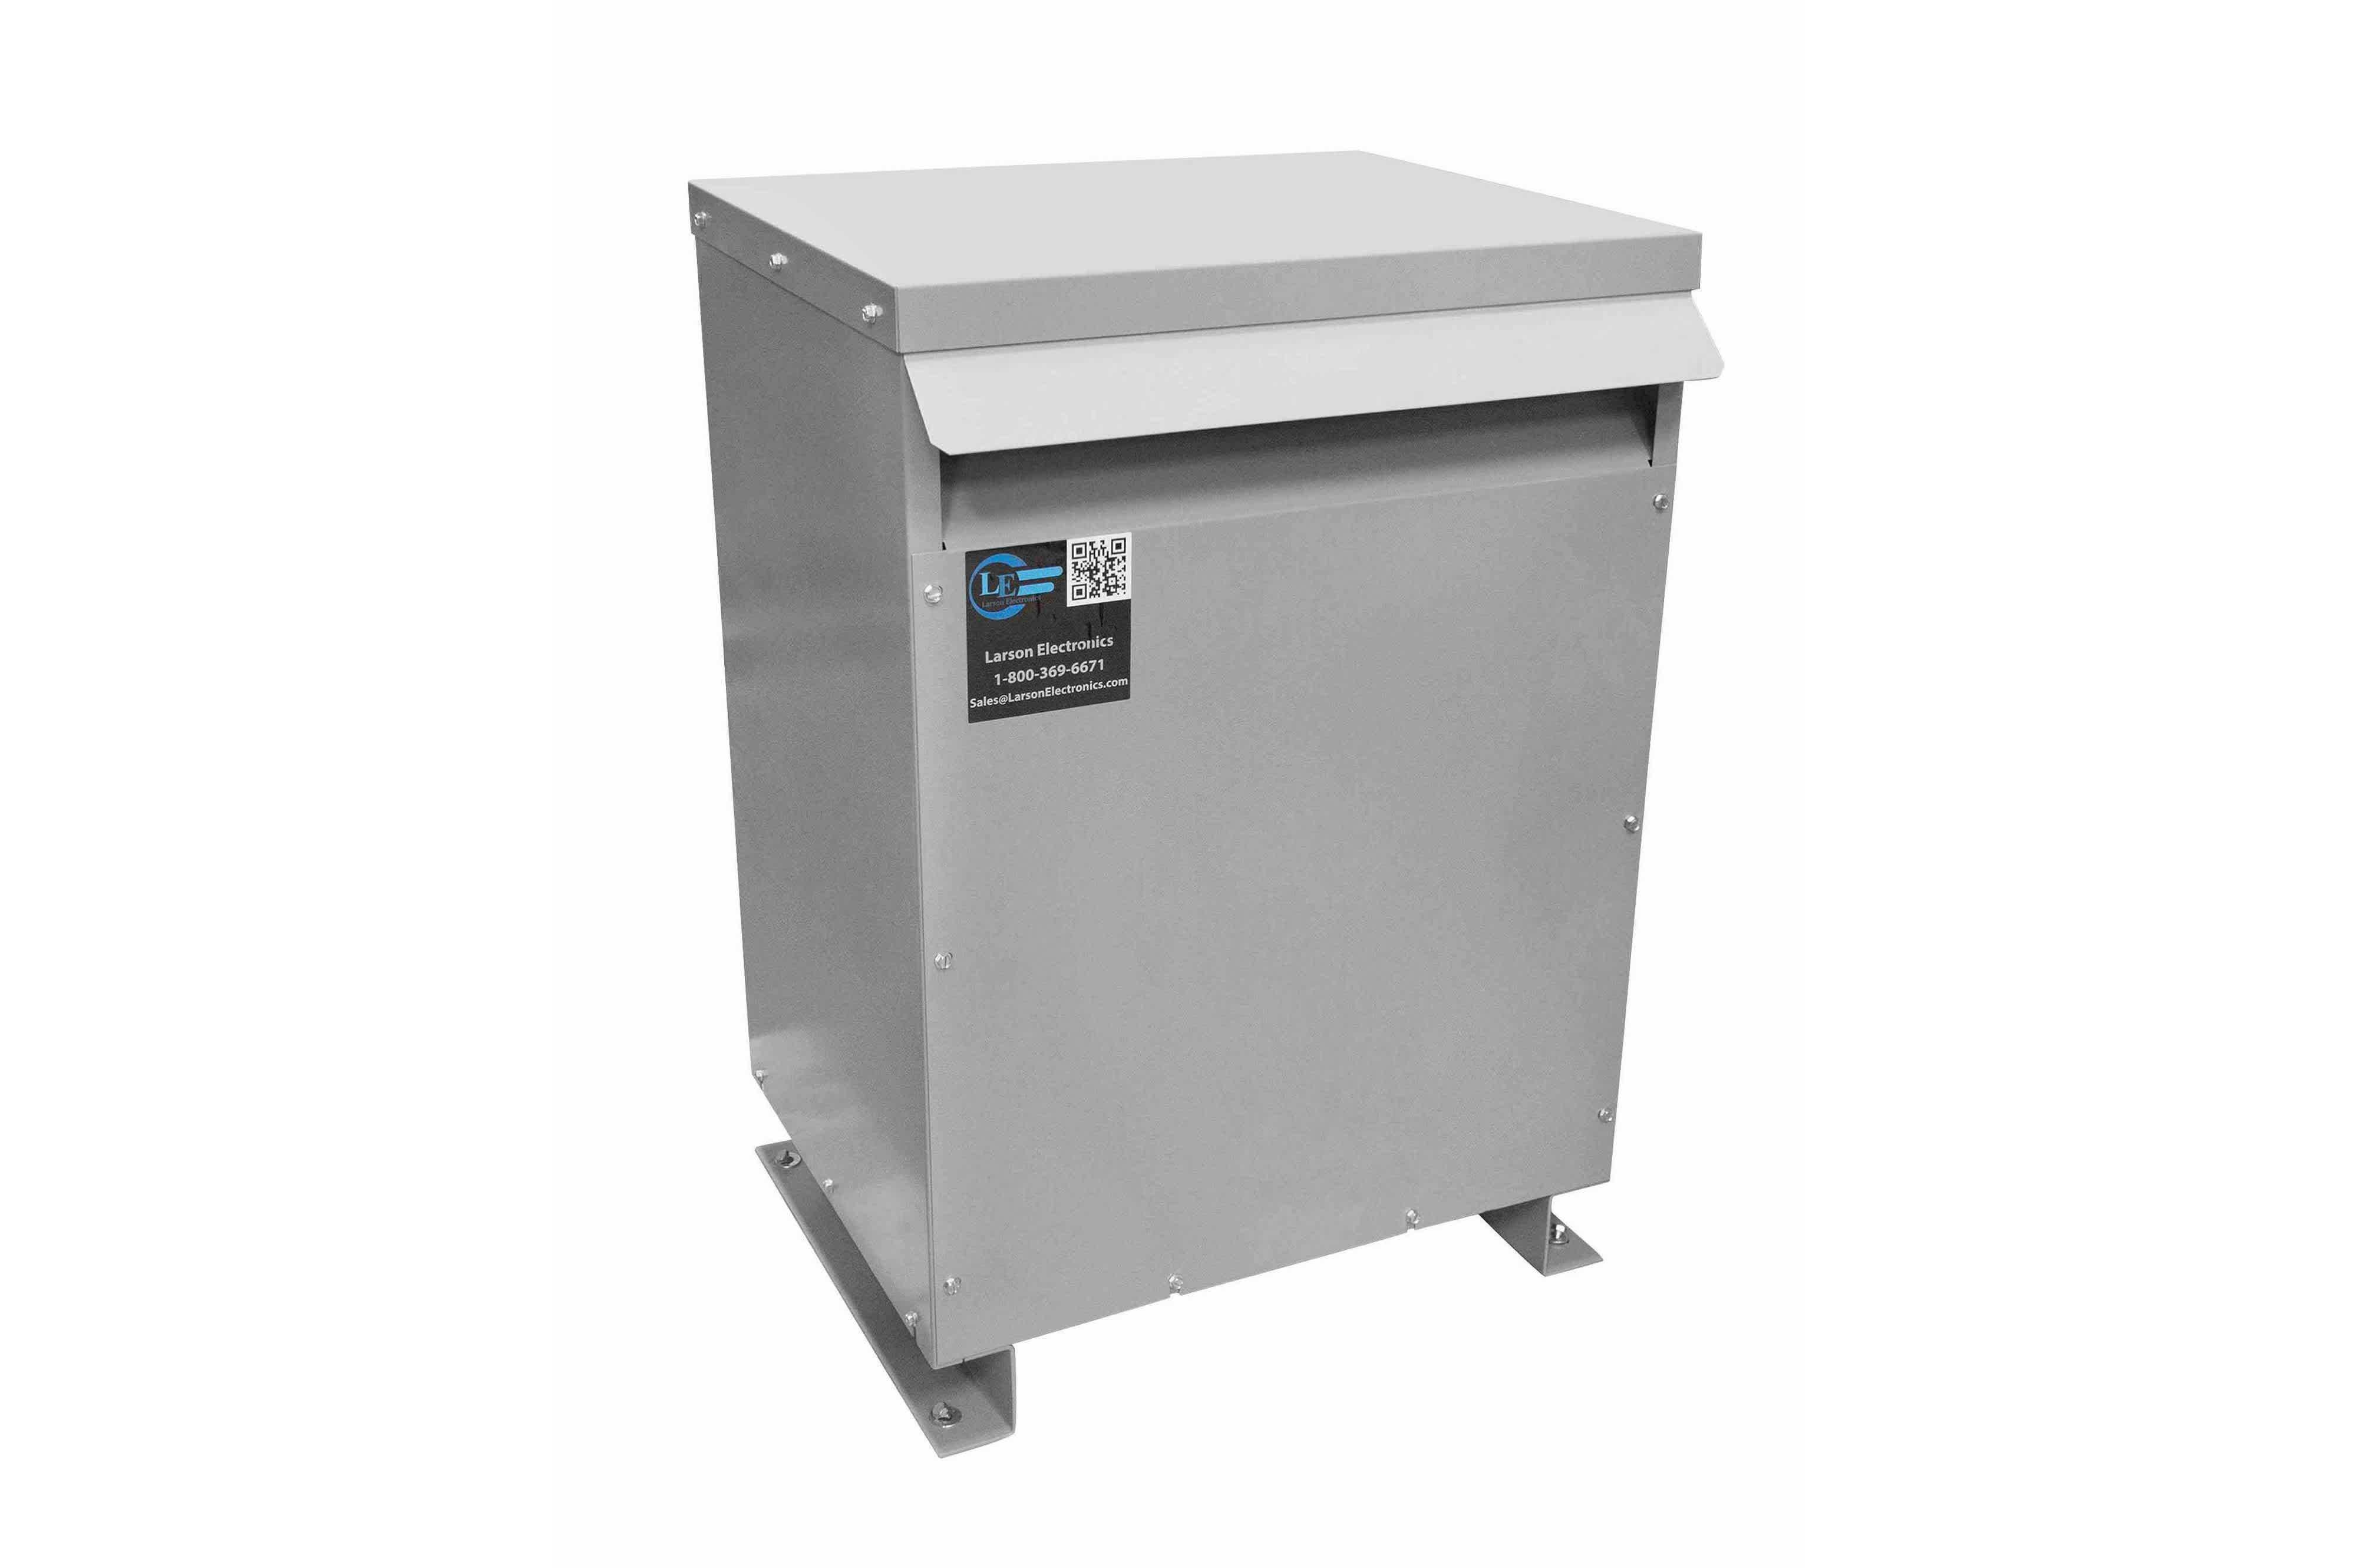 36 kVA 3PH Isolation Transformer, 415V Wye Primary, 480Y/277 Wye-N Secondary, N3R, Ventilated, 60 Hz